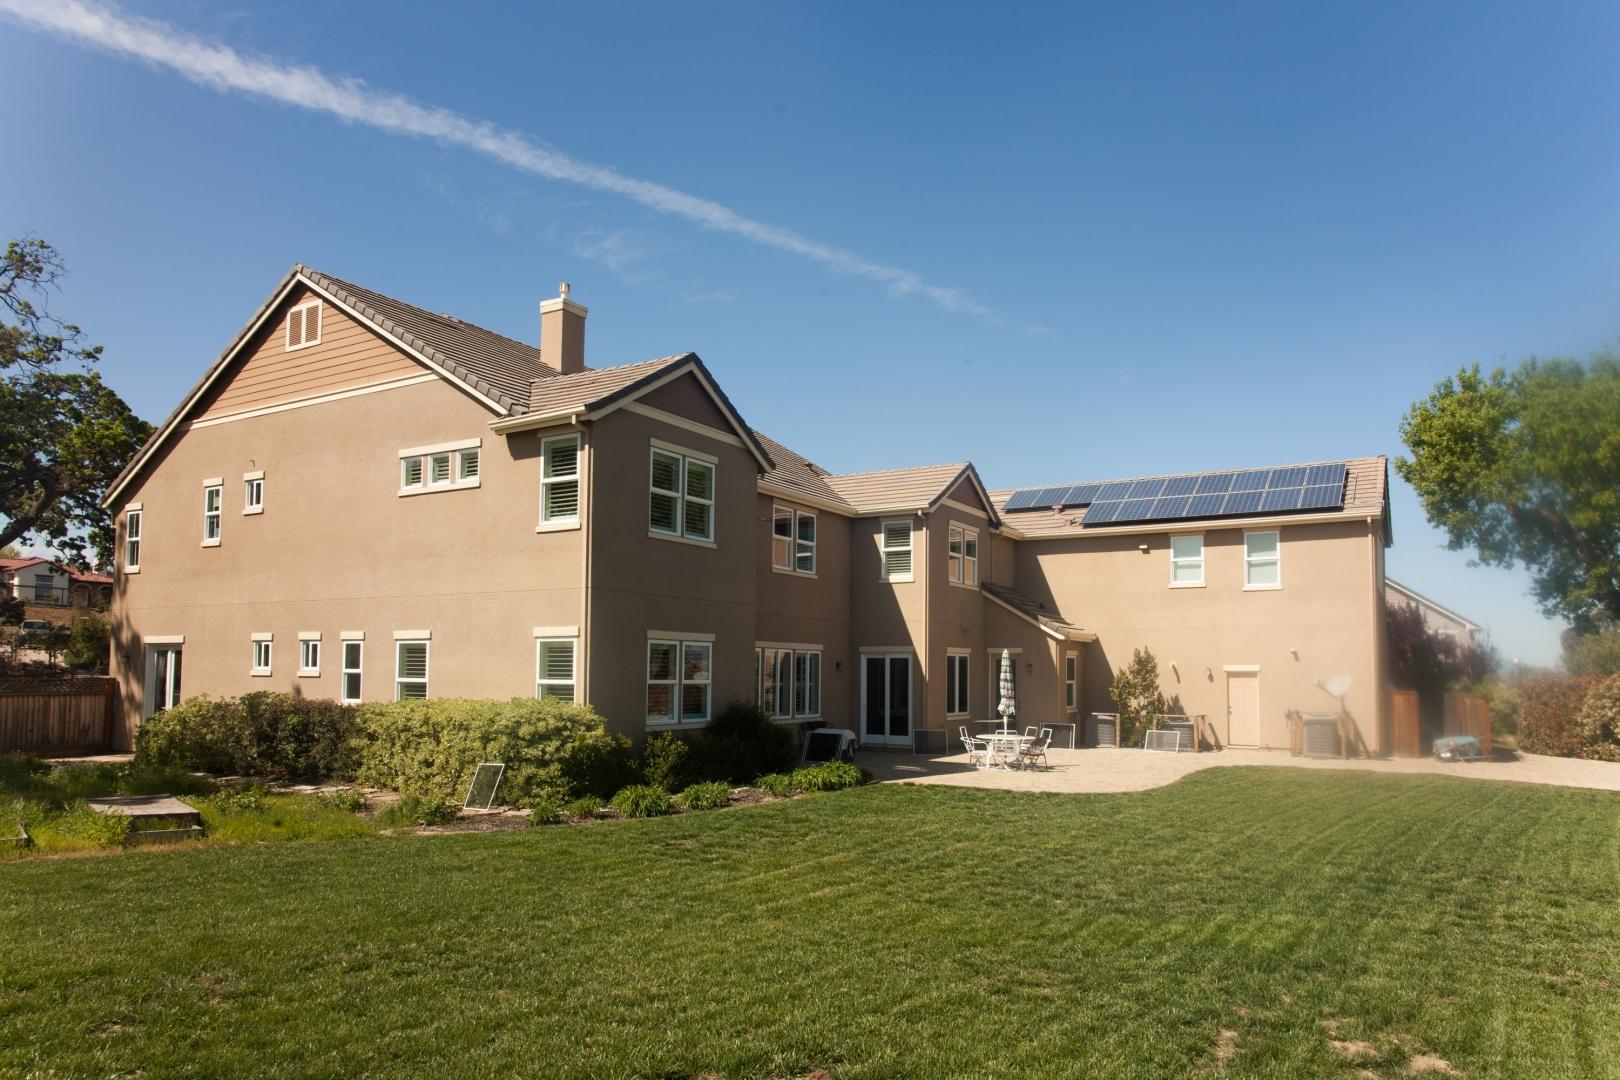 solar panel_at_back